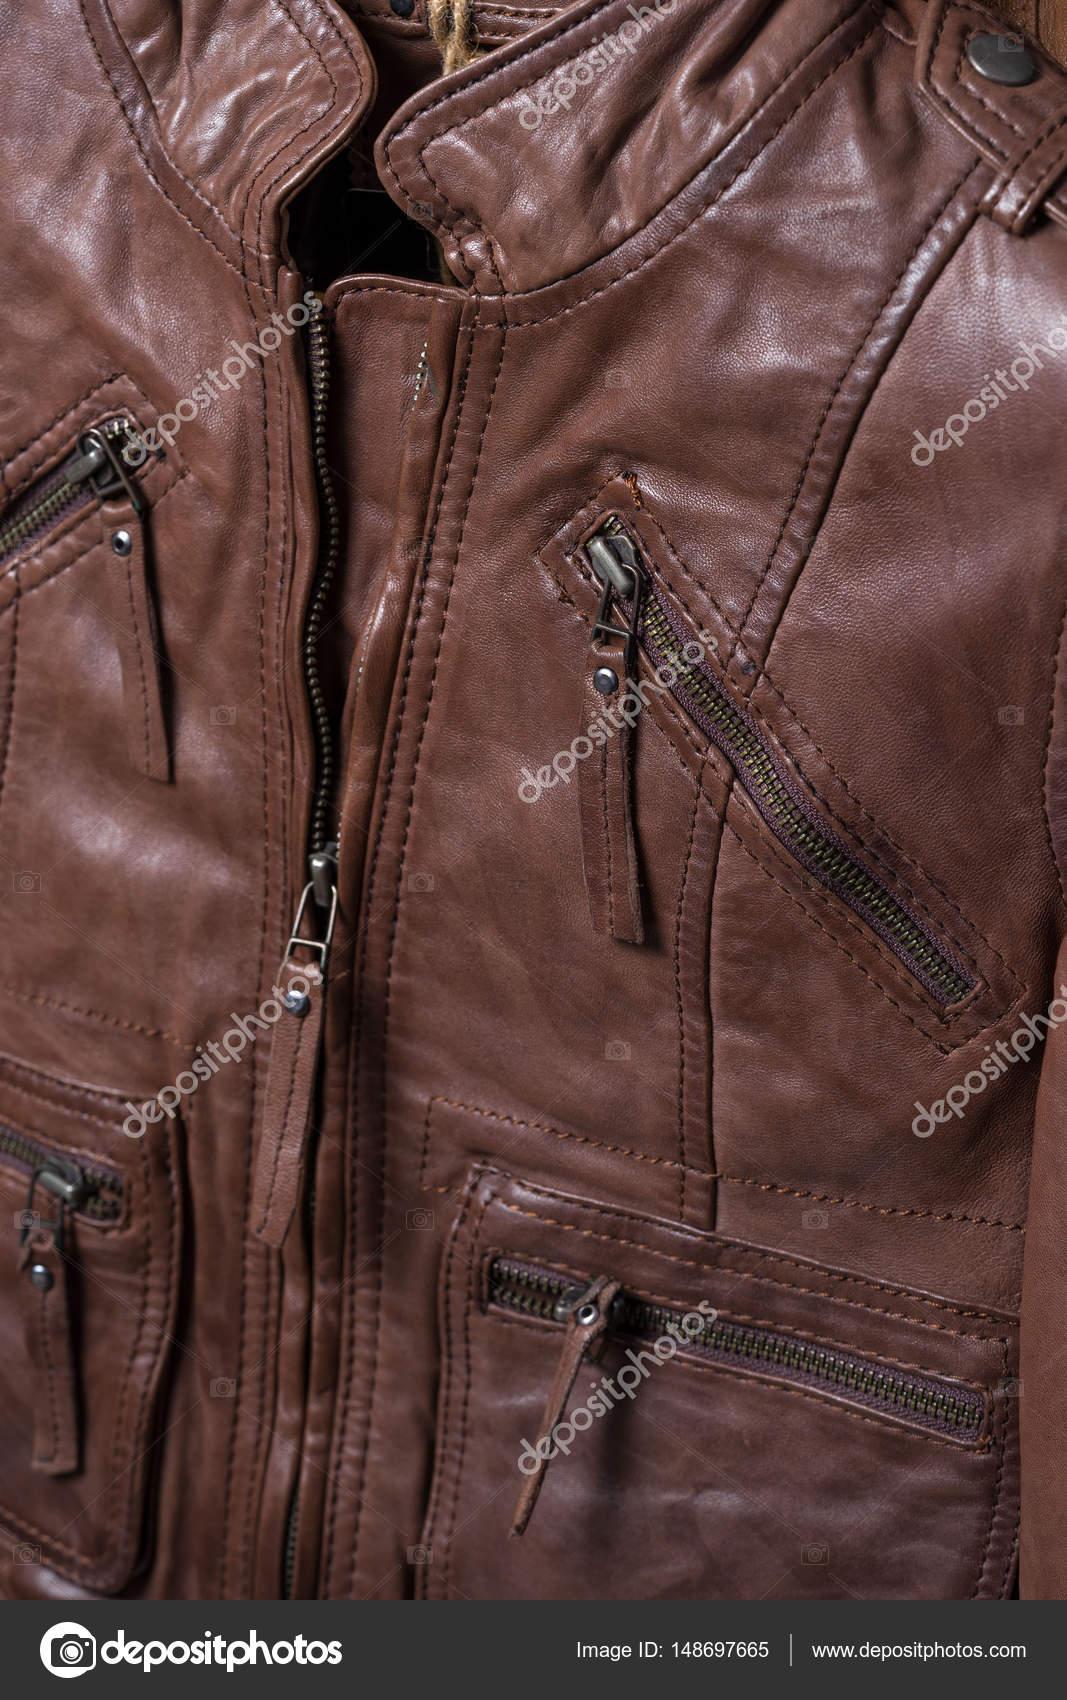 9676144da8e2 Μπουφάν καφέ δέρμα σαγρέ υφής. Δερμάτινο σακάκι μακροεντολή λεπτομέρειες.  Σακάκι φερμουάρ και τσέπες —